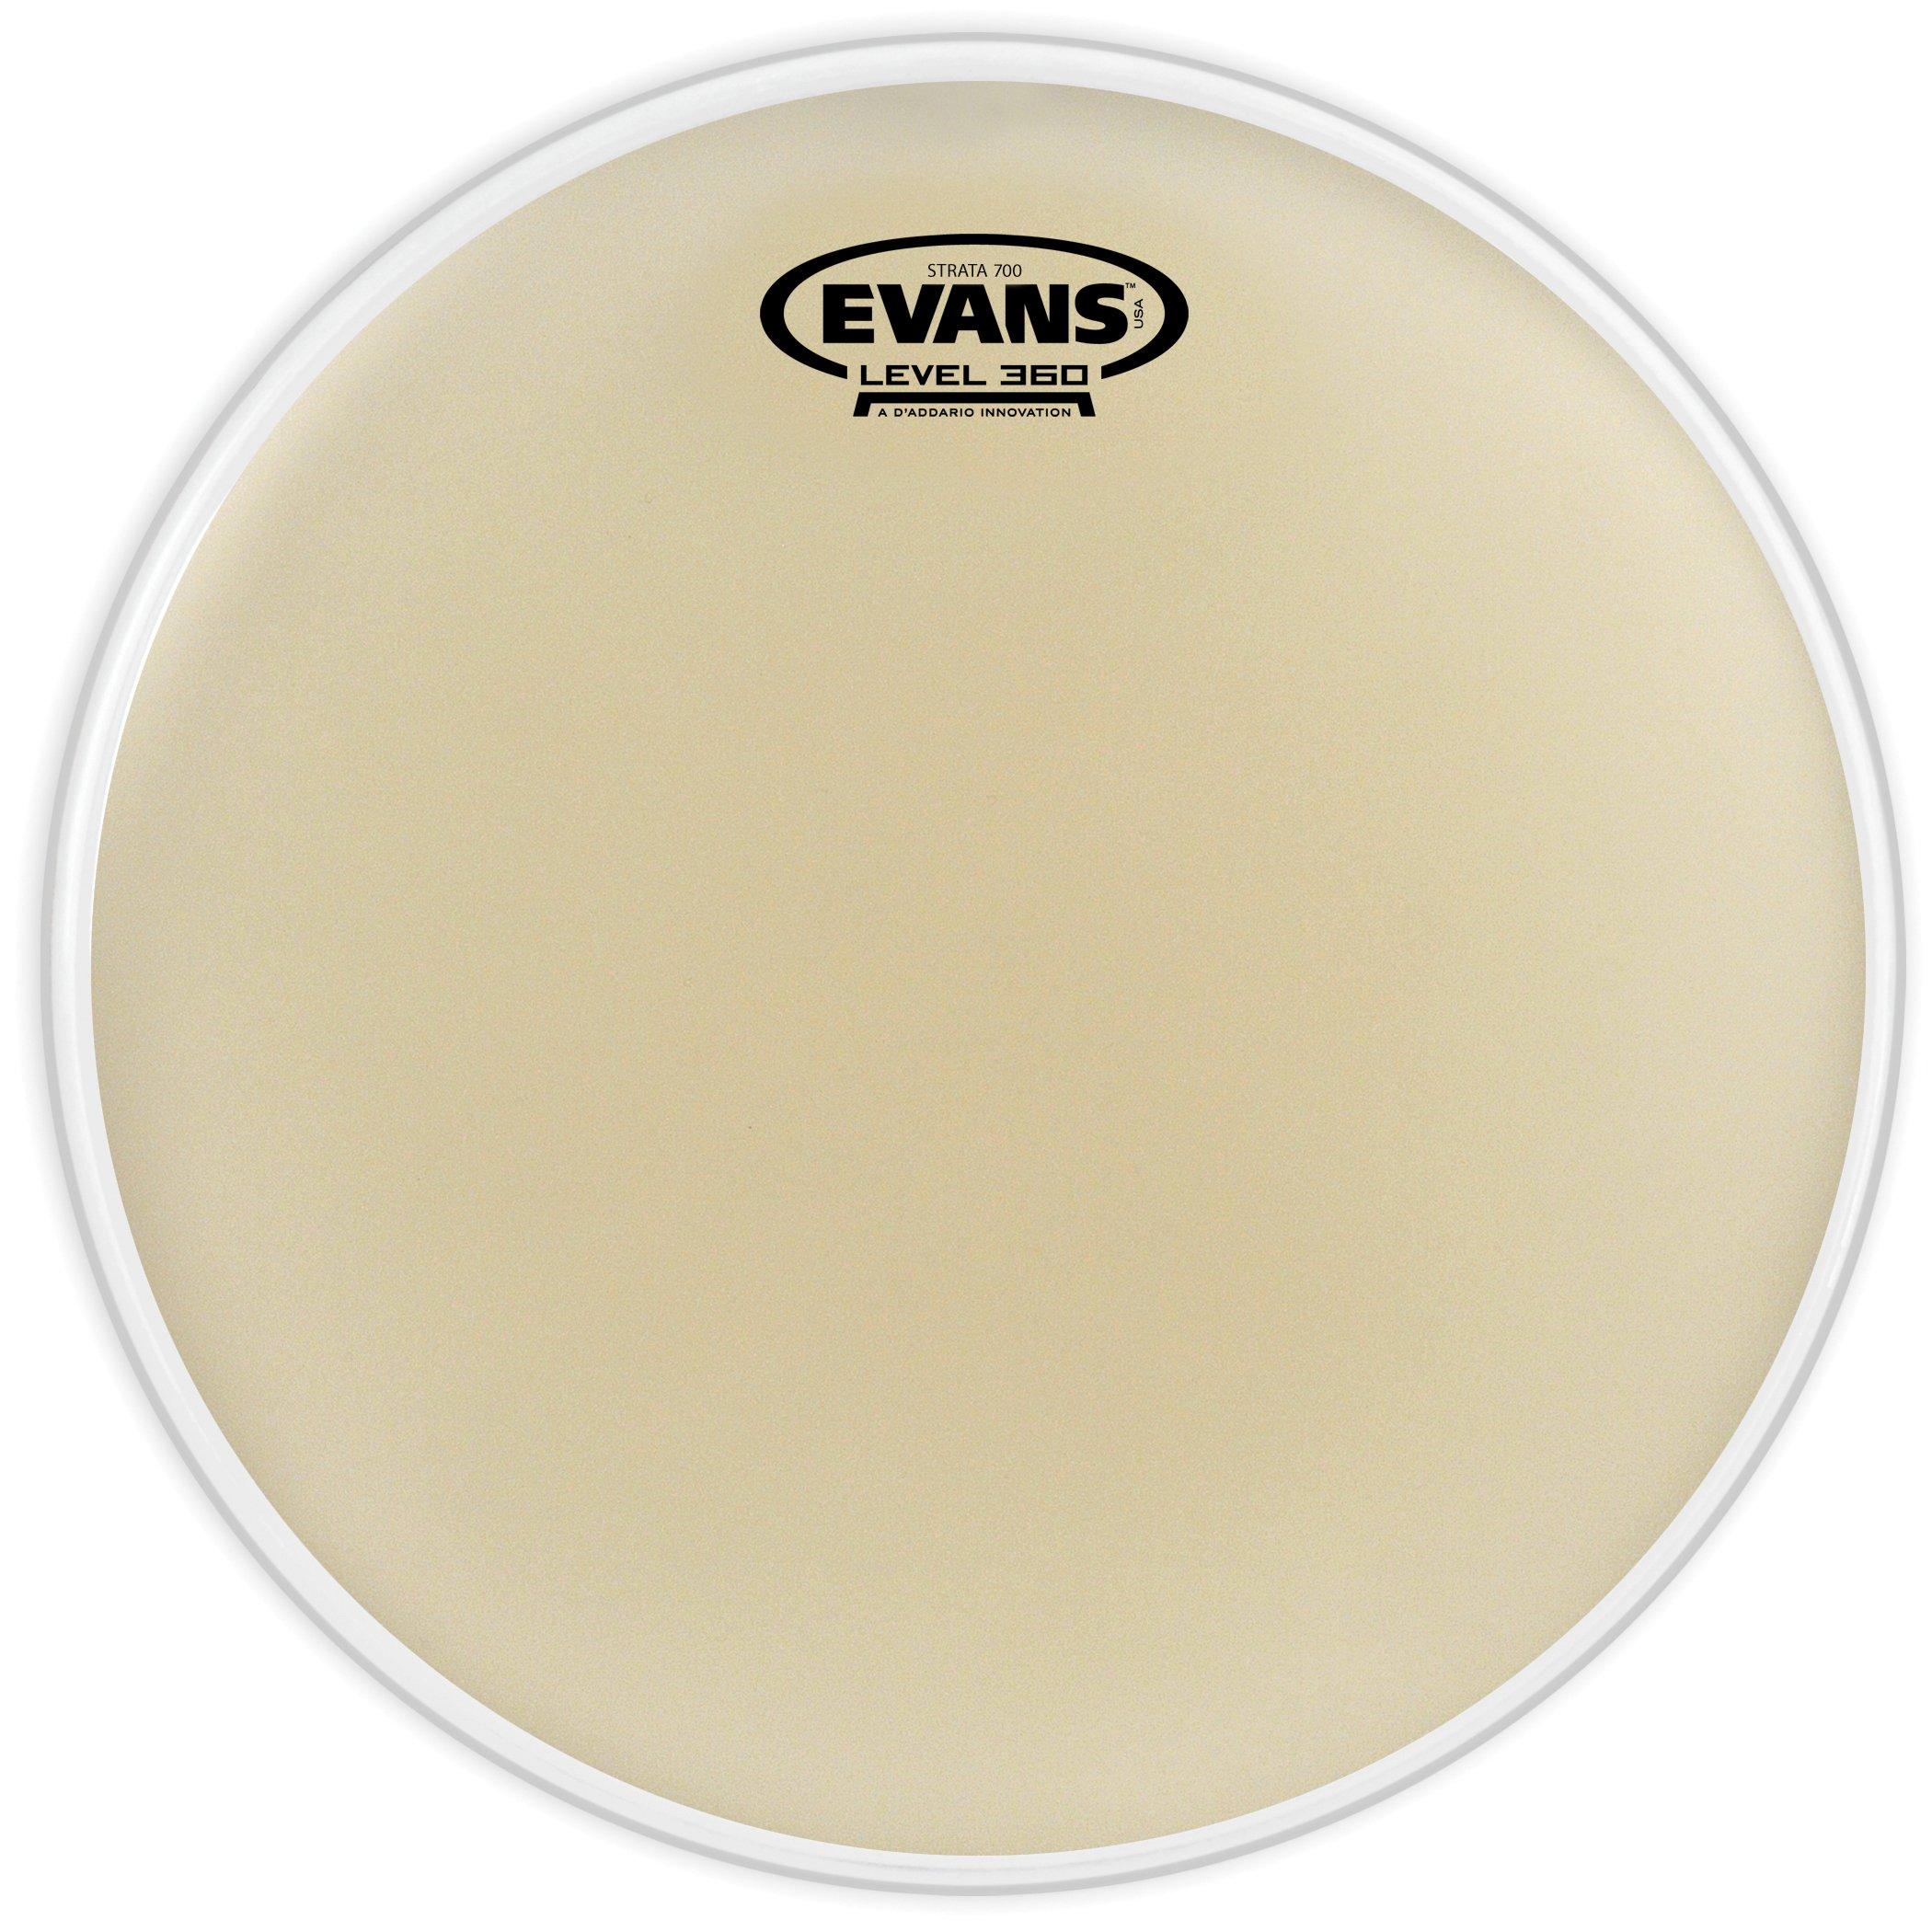 Evans Strata 700 Concert Snare Drum Head, 14 Inch